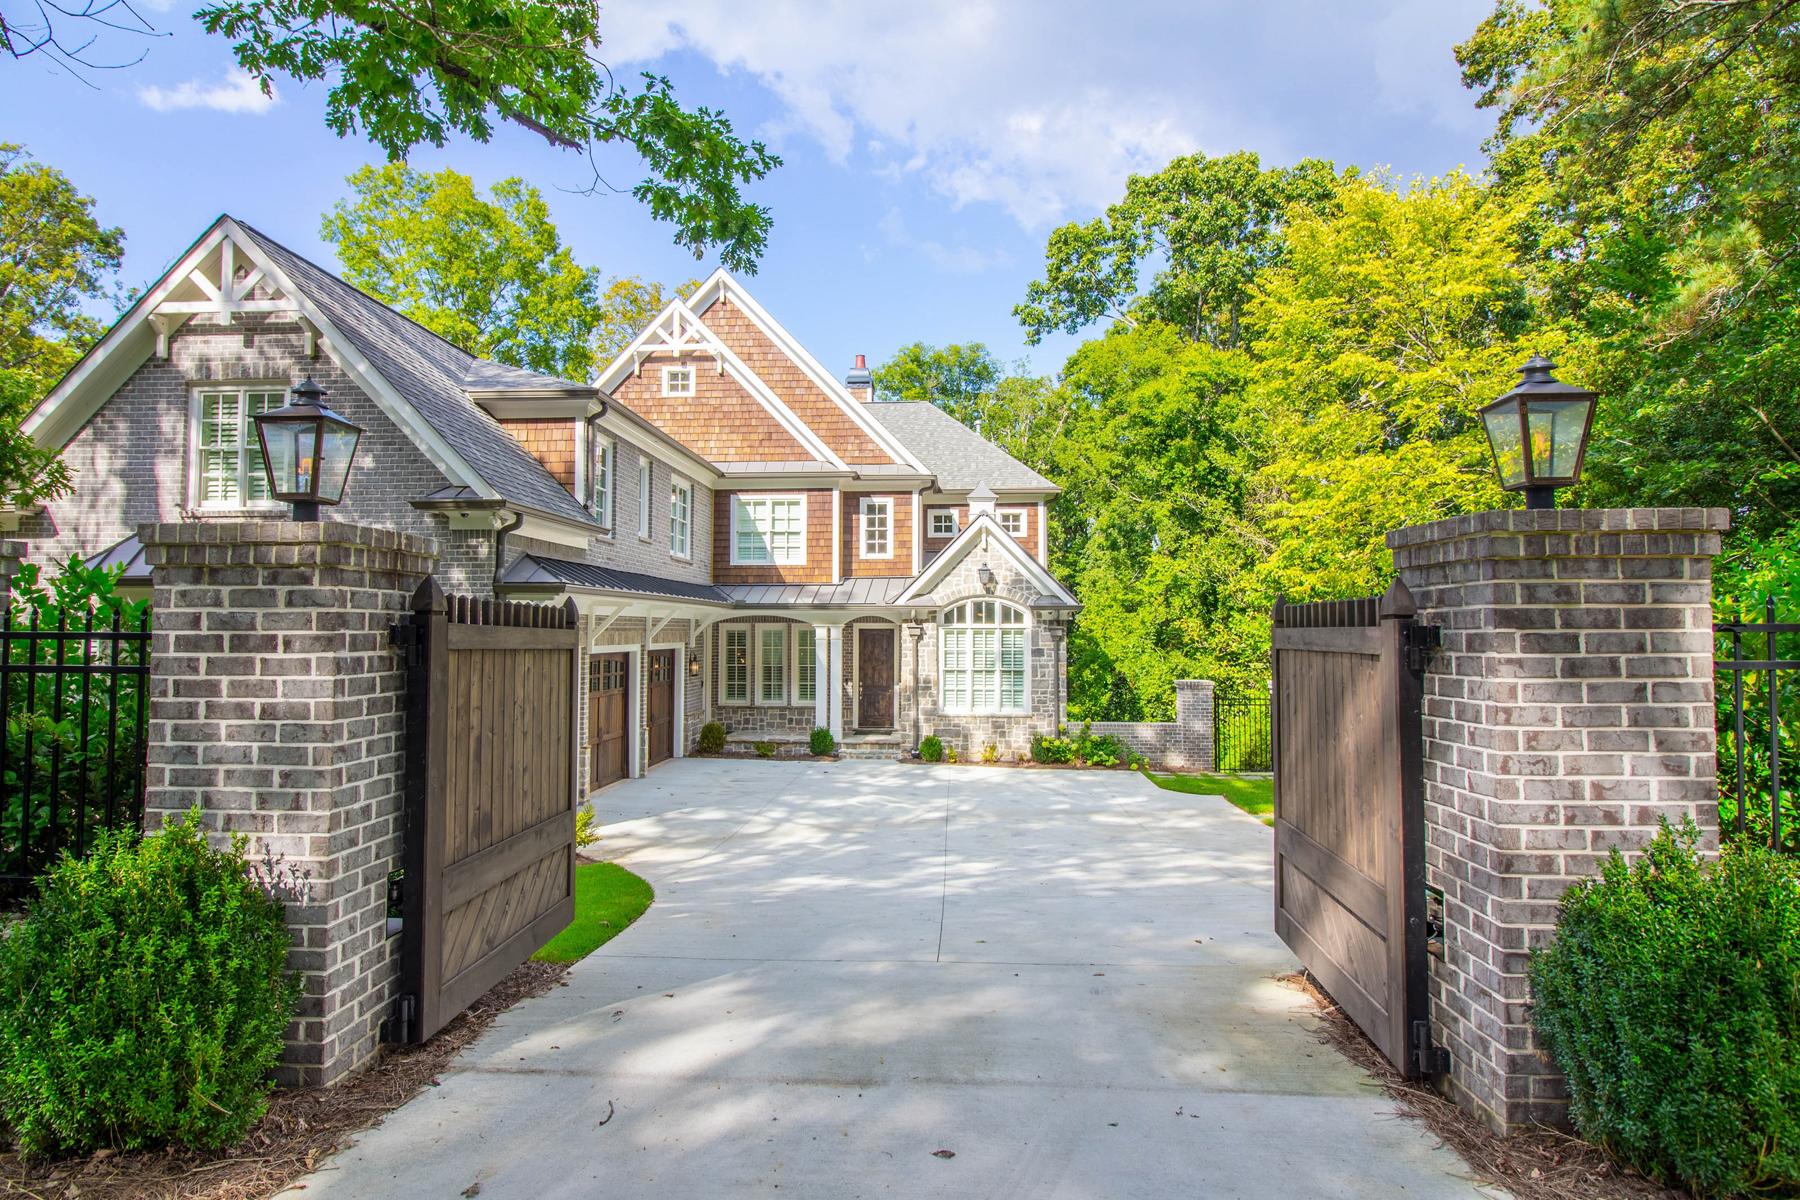 Tek Ailelik Ev için Satış at Superior Construction With Full Automation Throughout 1685 Mount Paran Road NW Buckhead, Atlanta, Georgia, 30327 Amerika Birleşik Devletleri